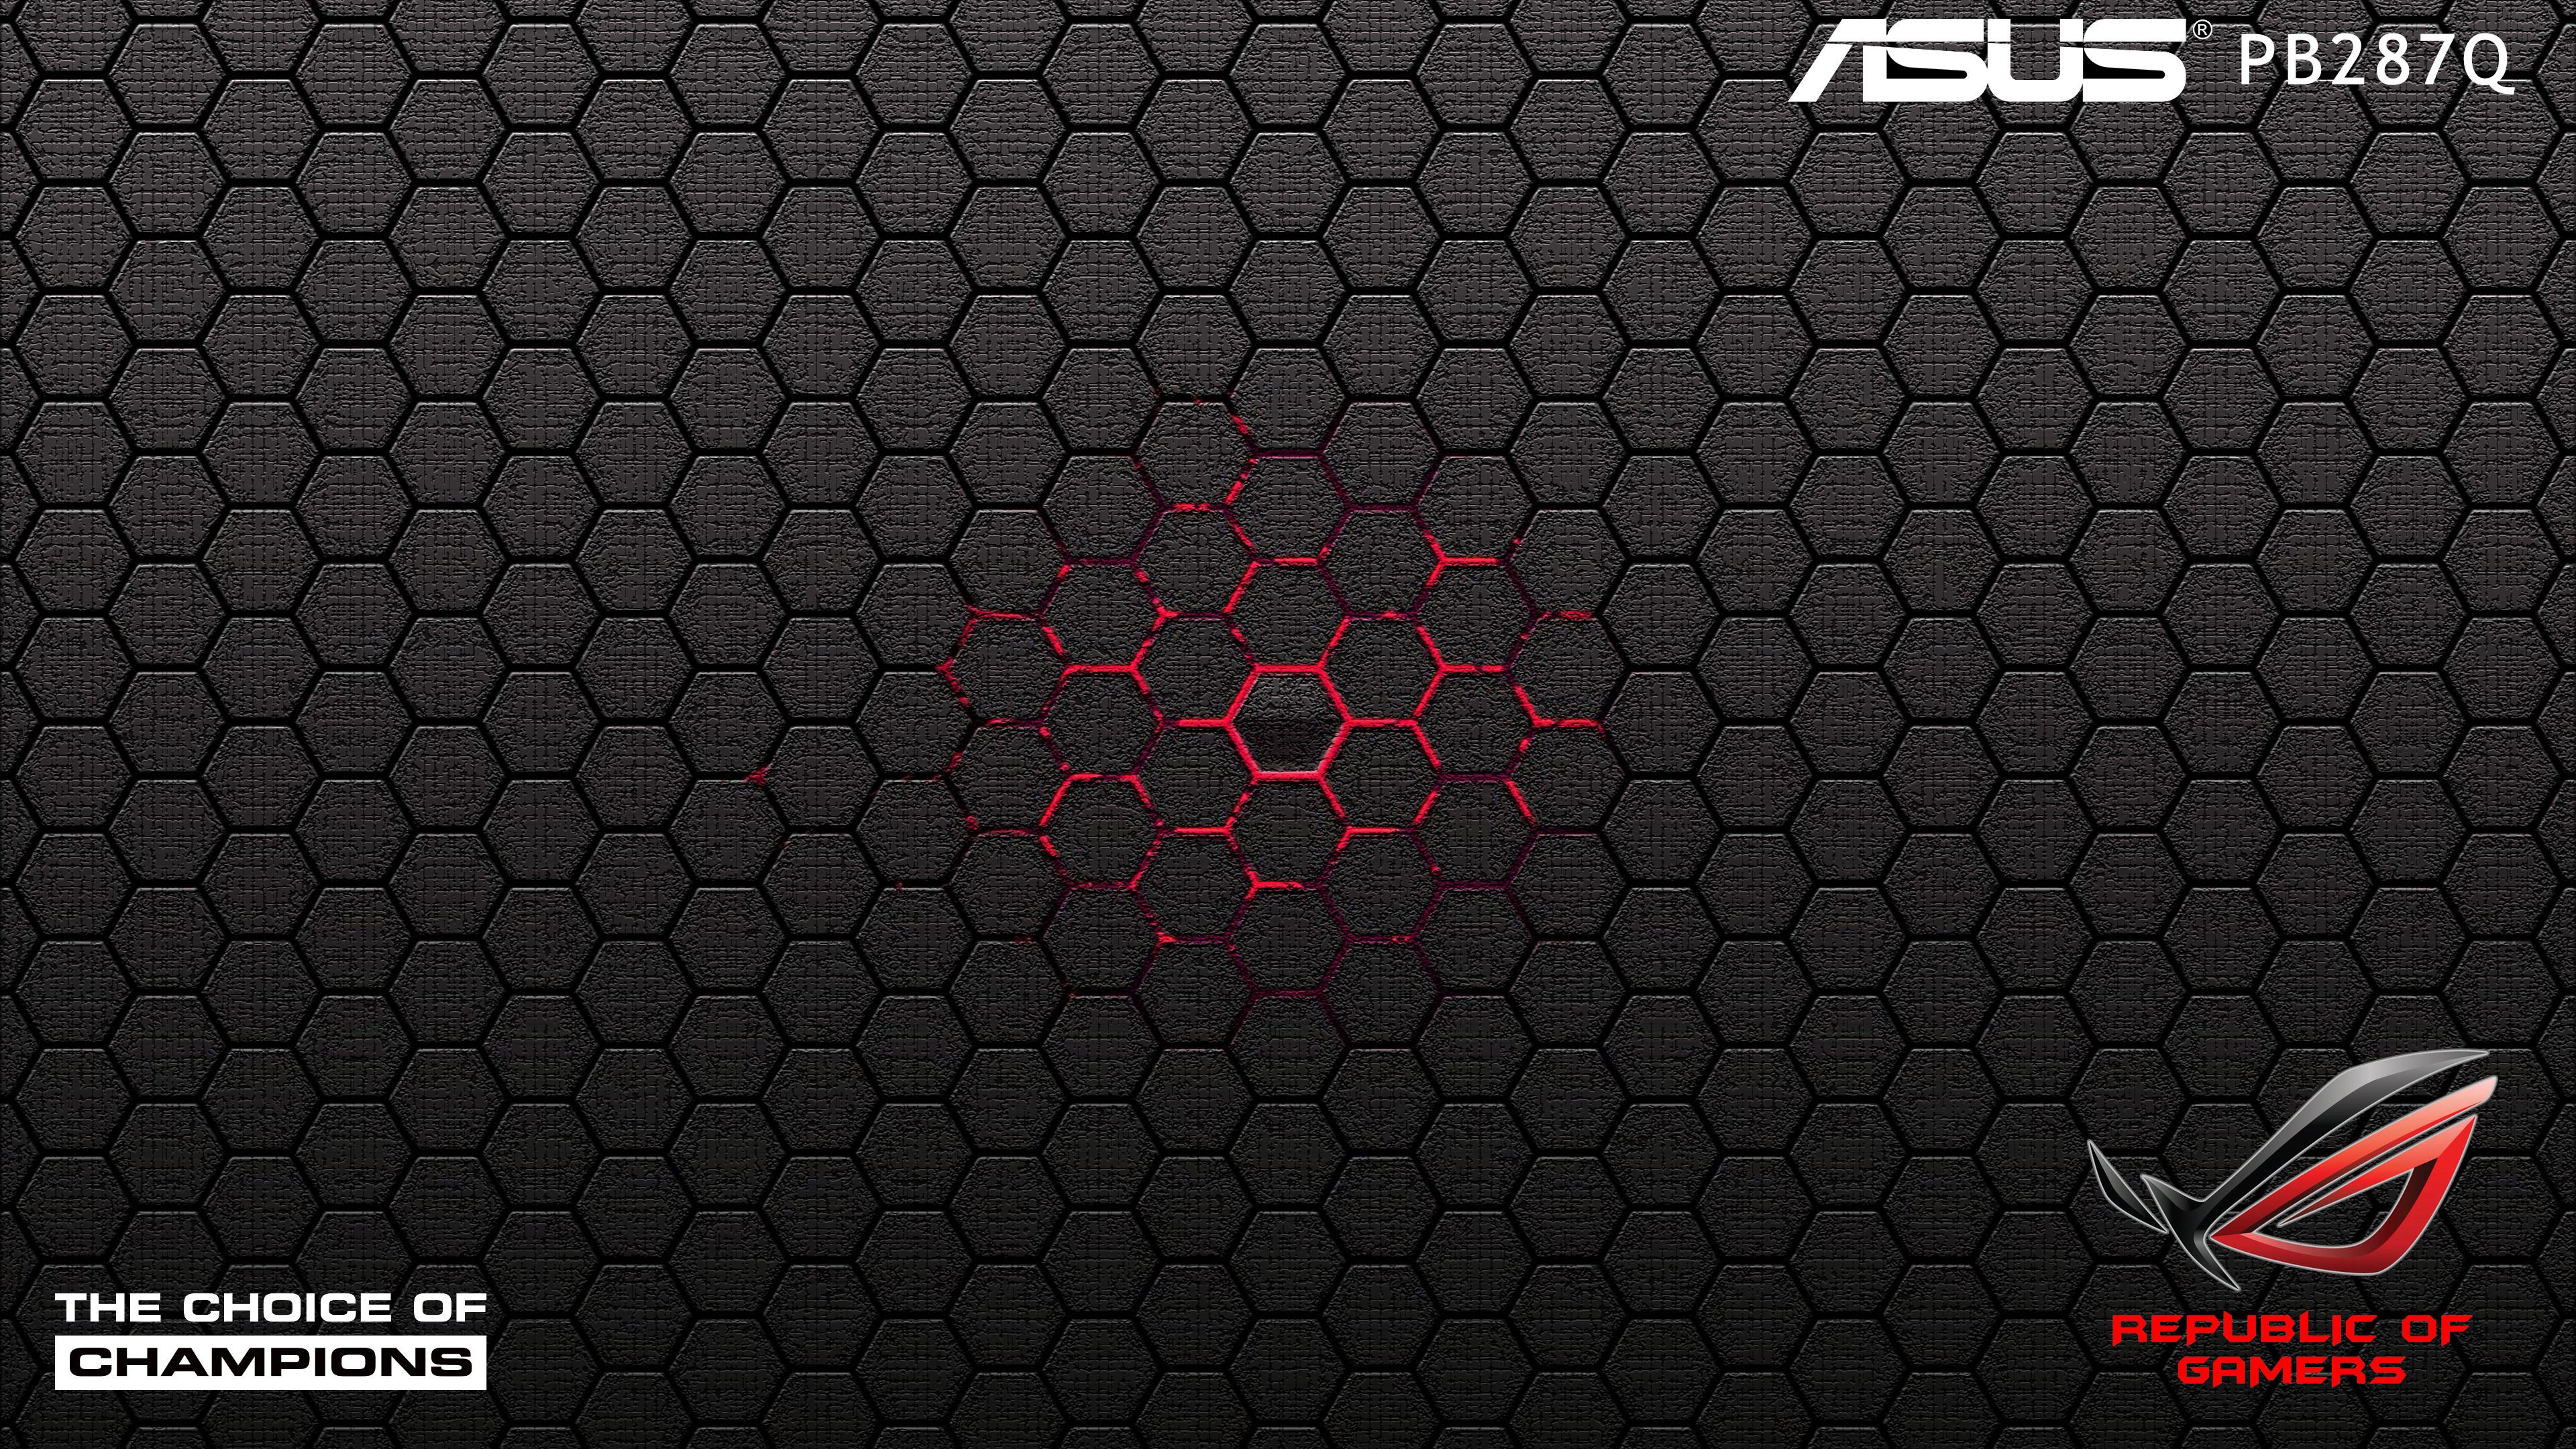 Free download Win An ASUS PB287Q Monitor 2014 4K UHD ...